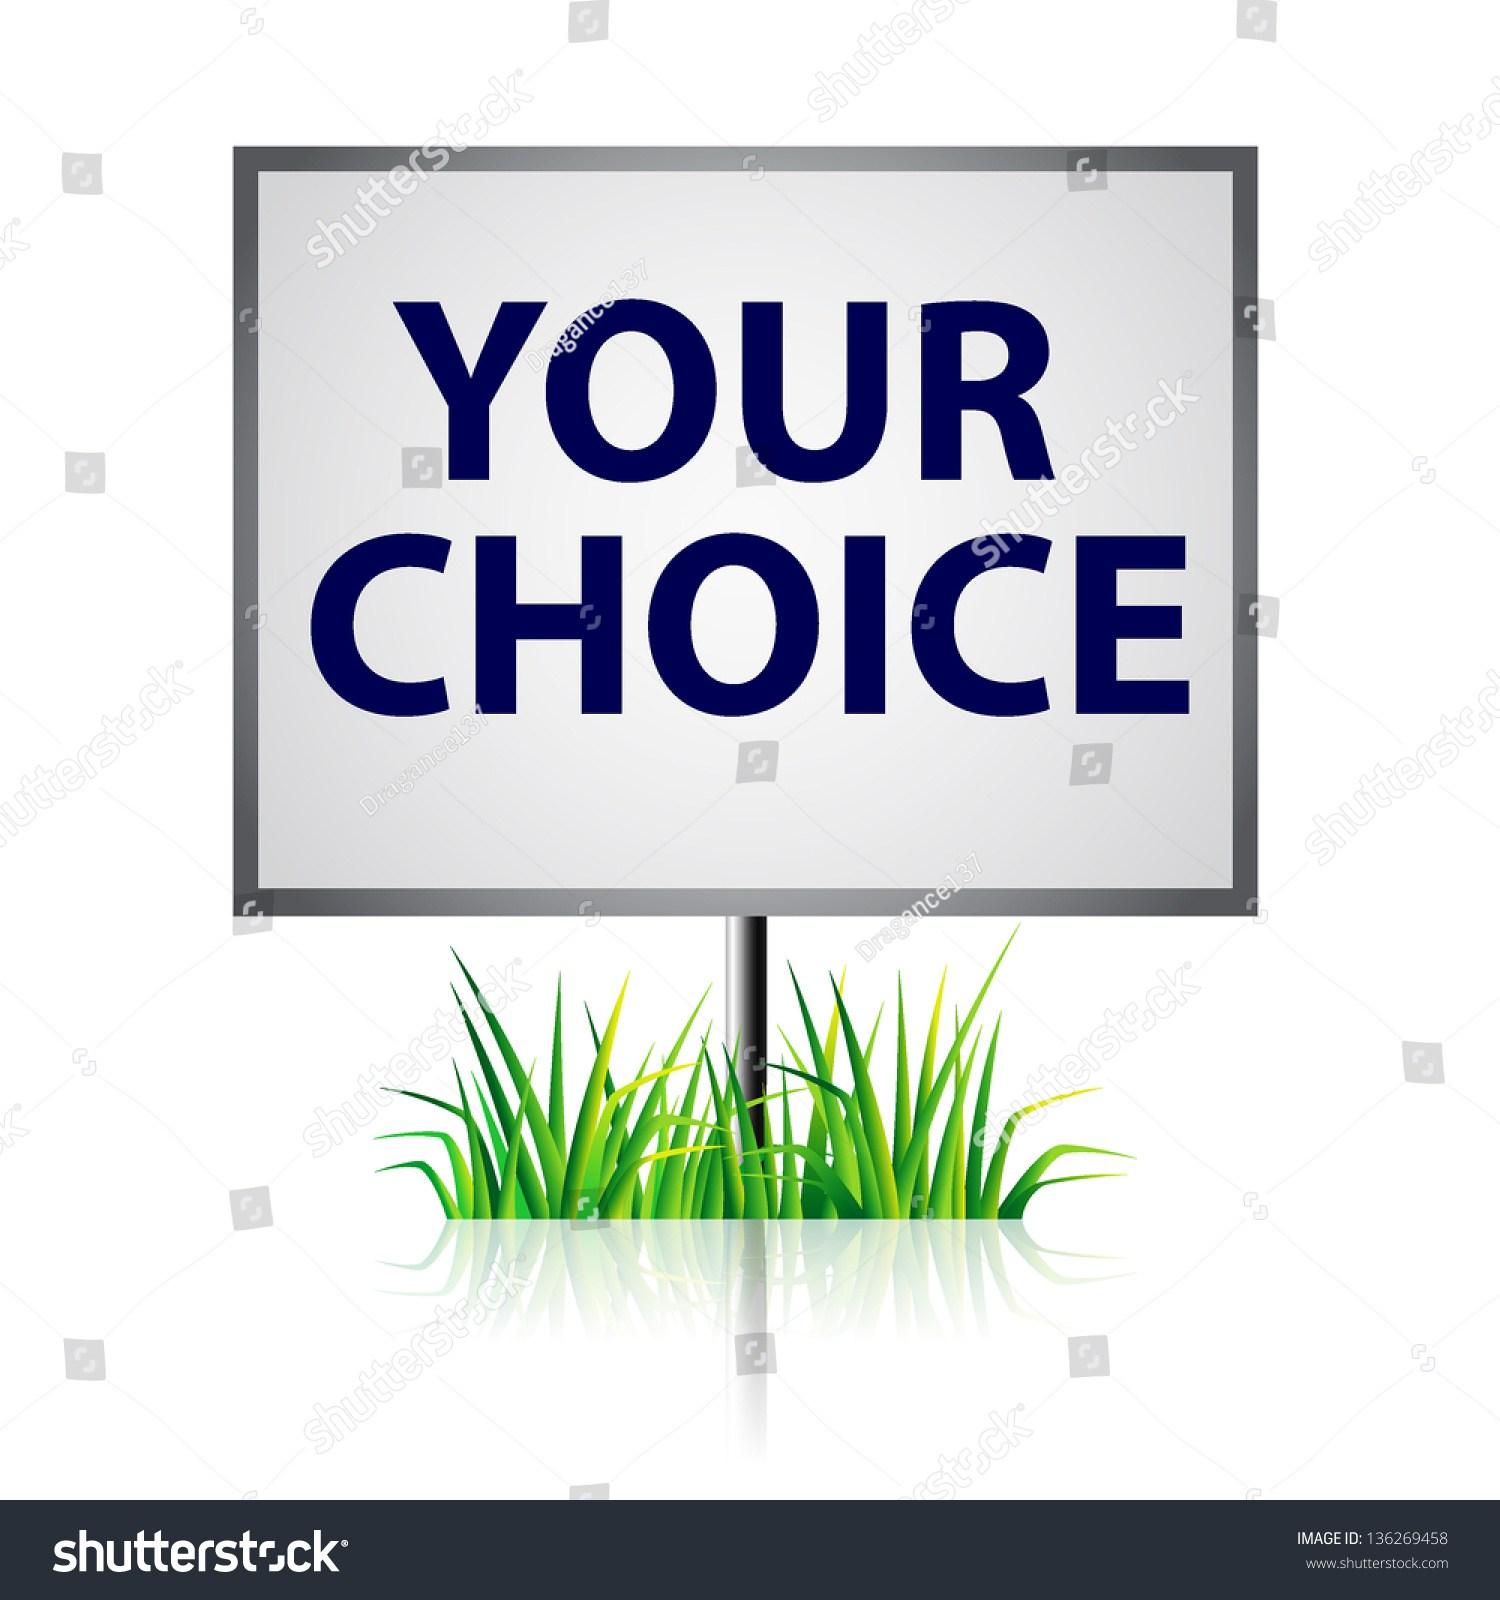 Your choice clipart 8 » Clipart Portal.